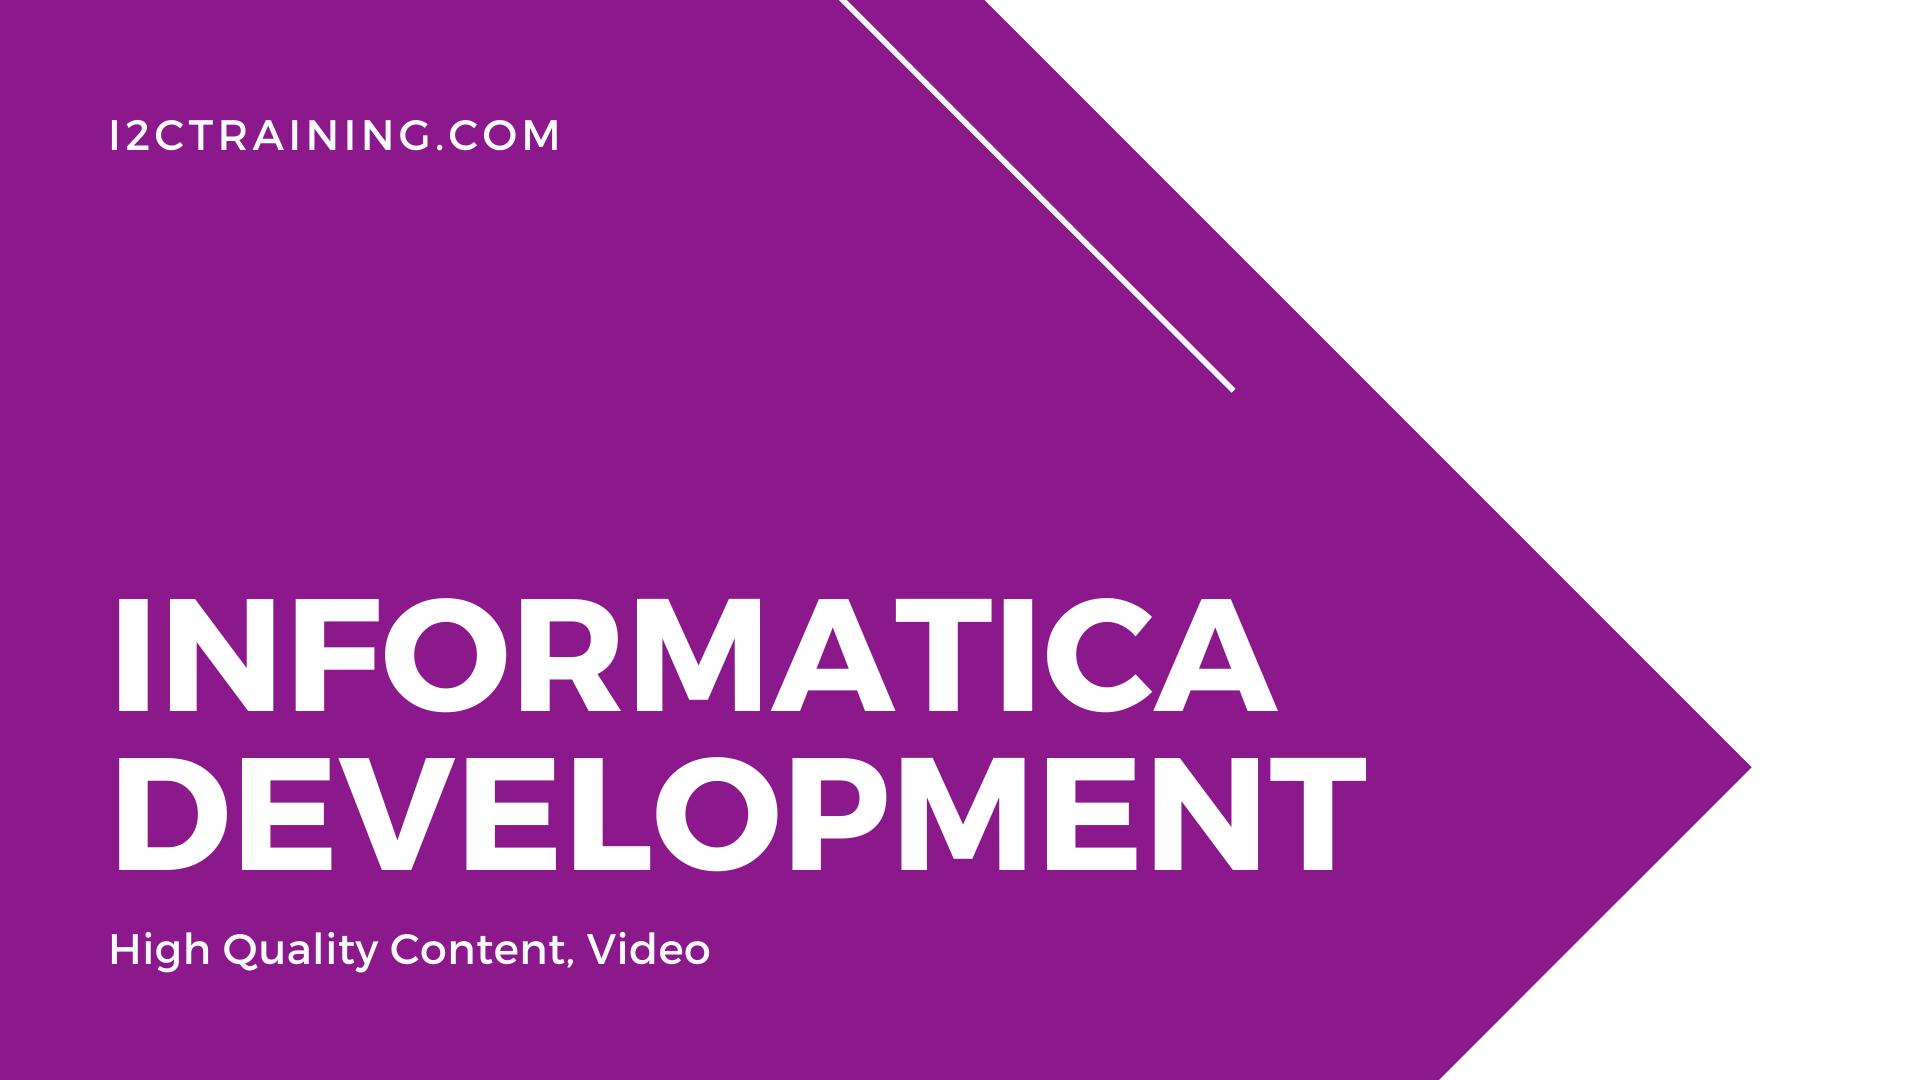 I2ctraining Online Courses informatica development